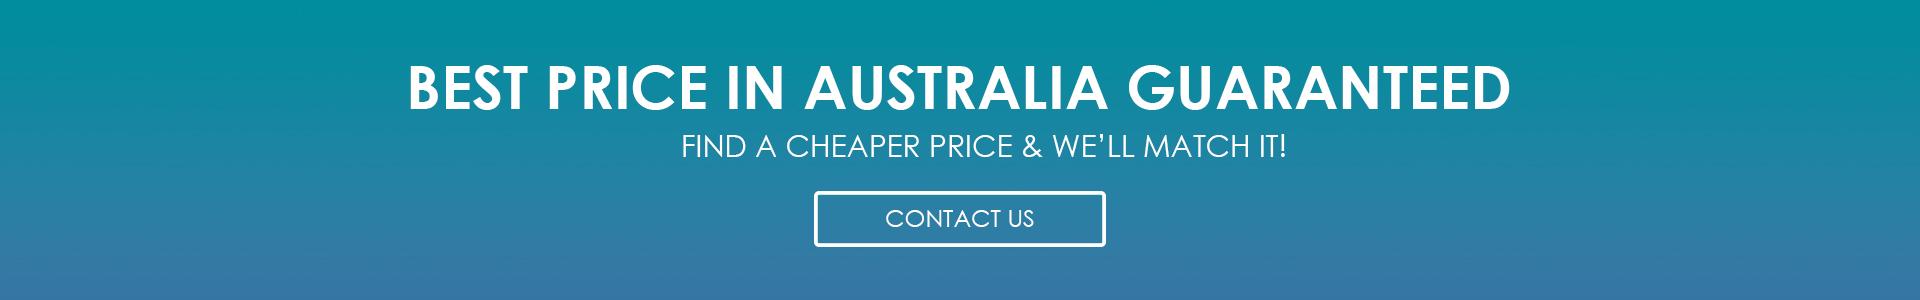 price-match-banner1.jpg